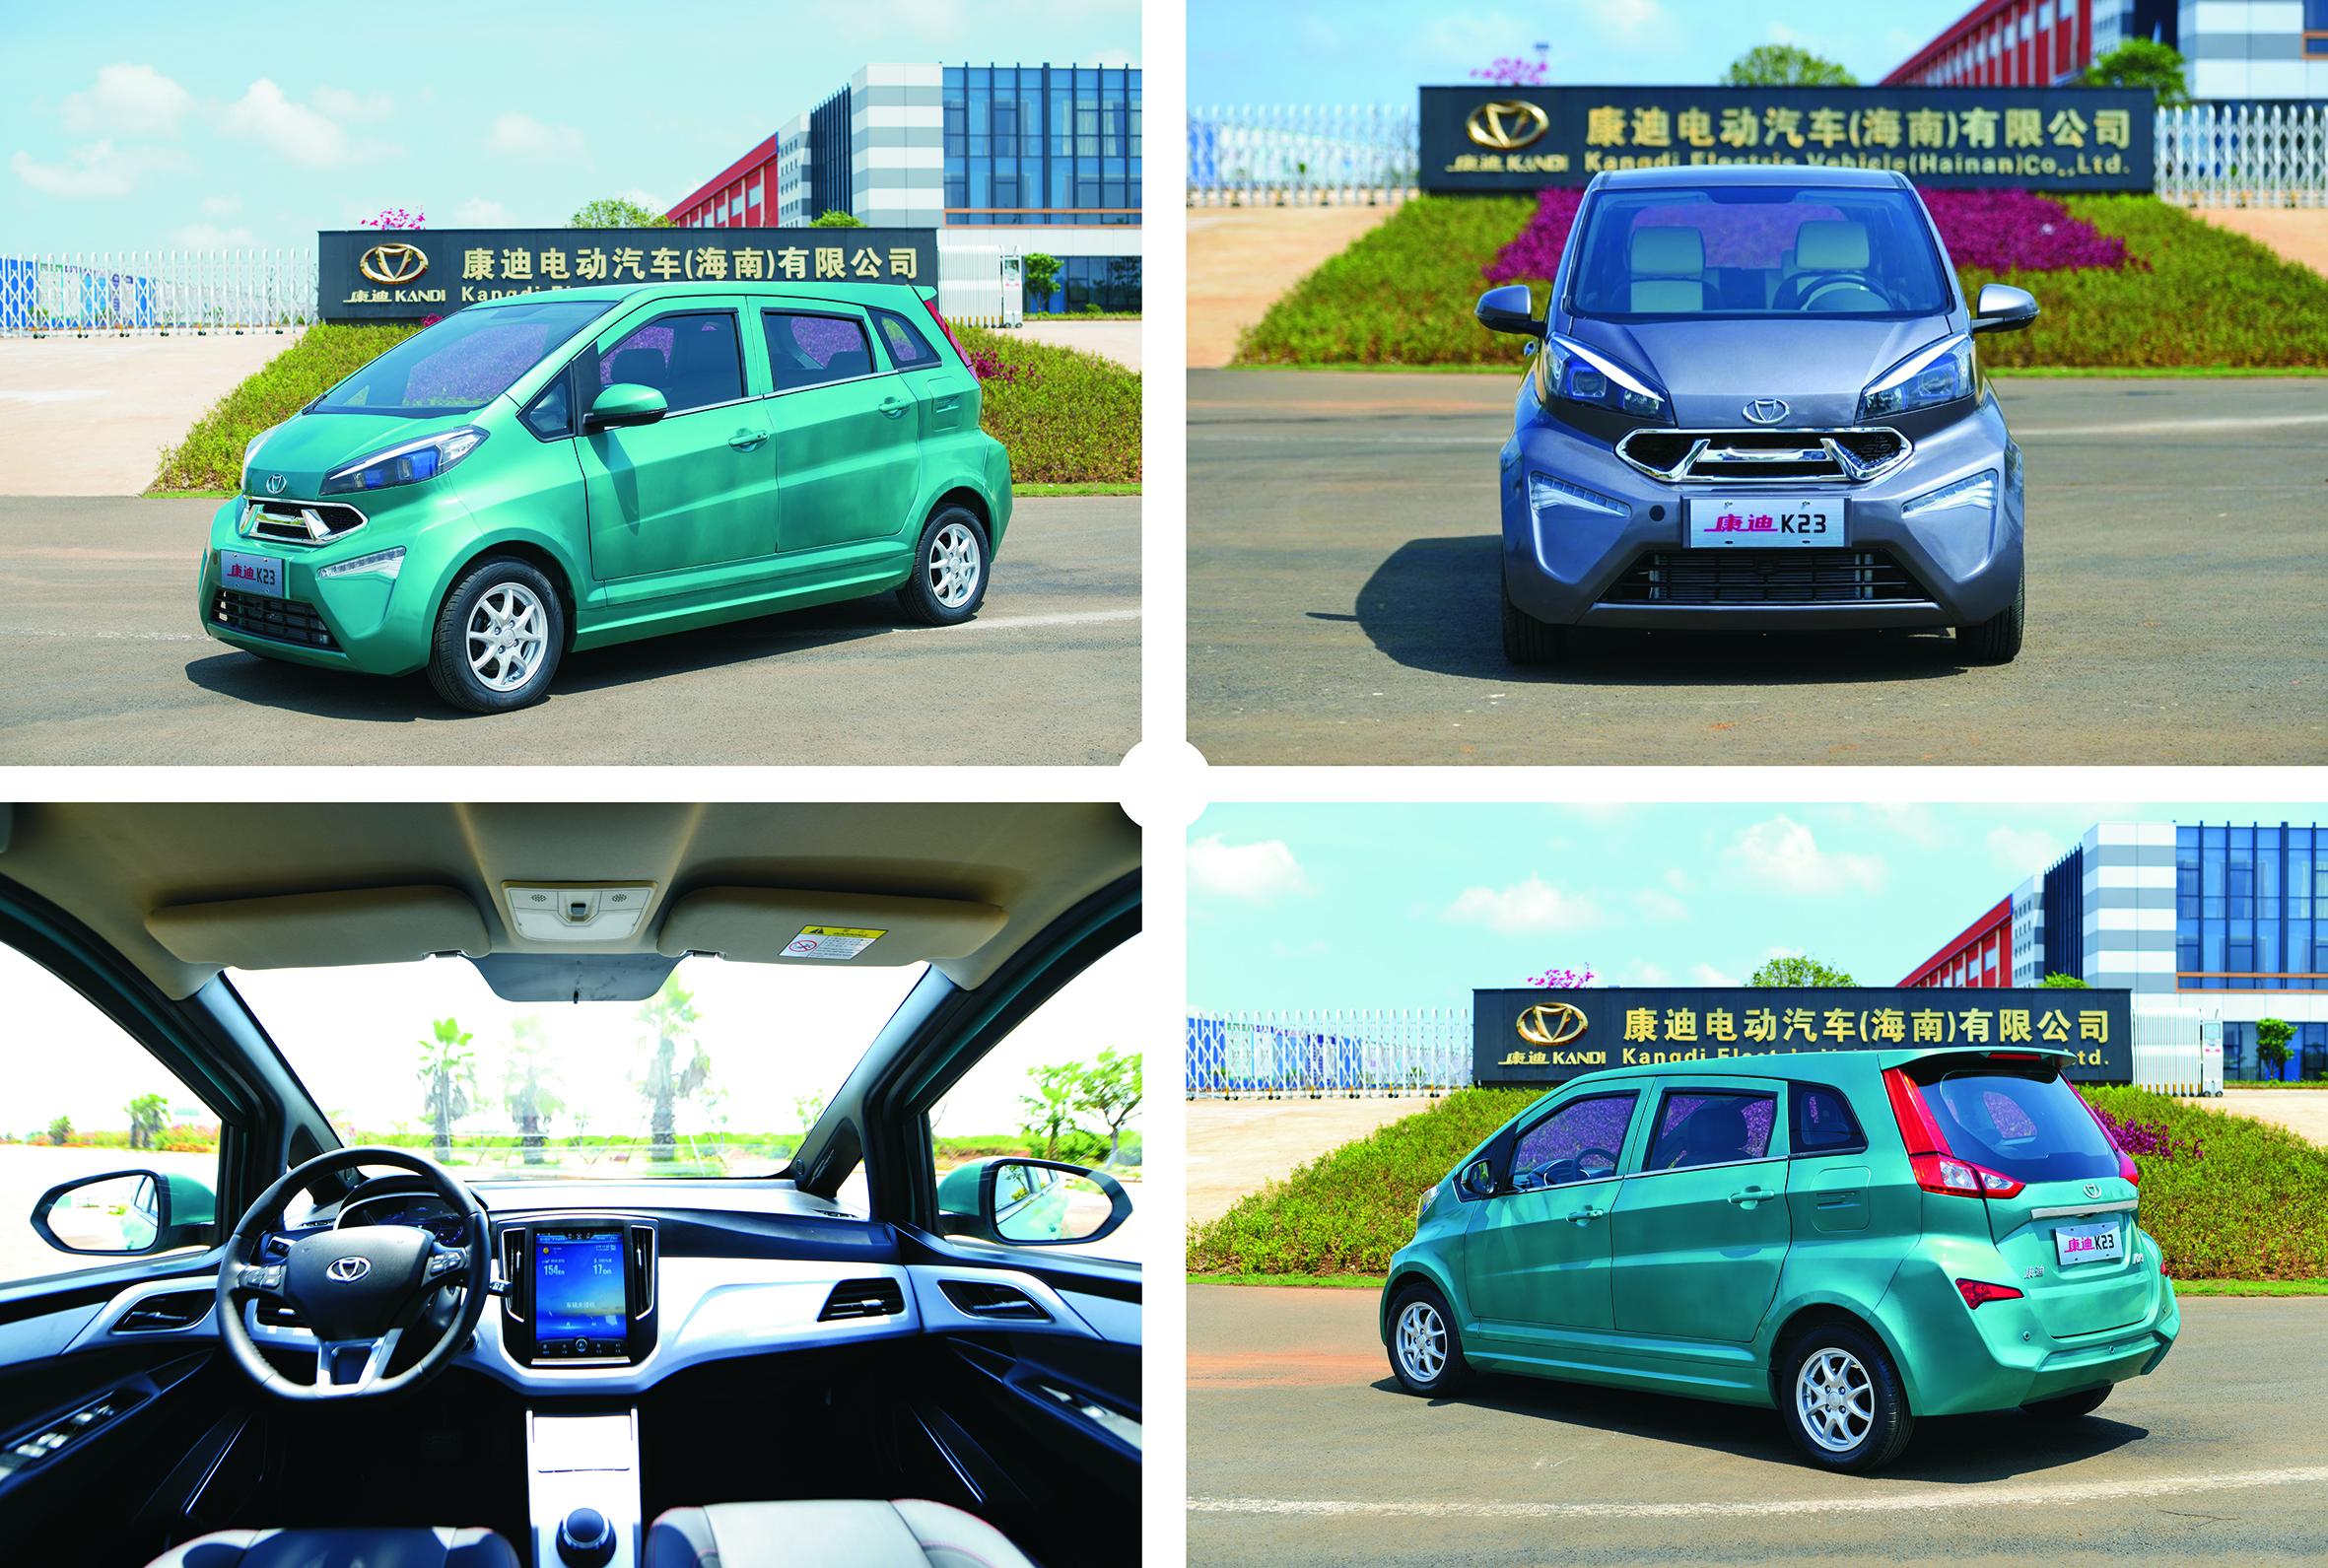 Kandi's E-Vehicle K23 to Launch Sales in U.S